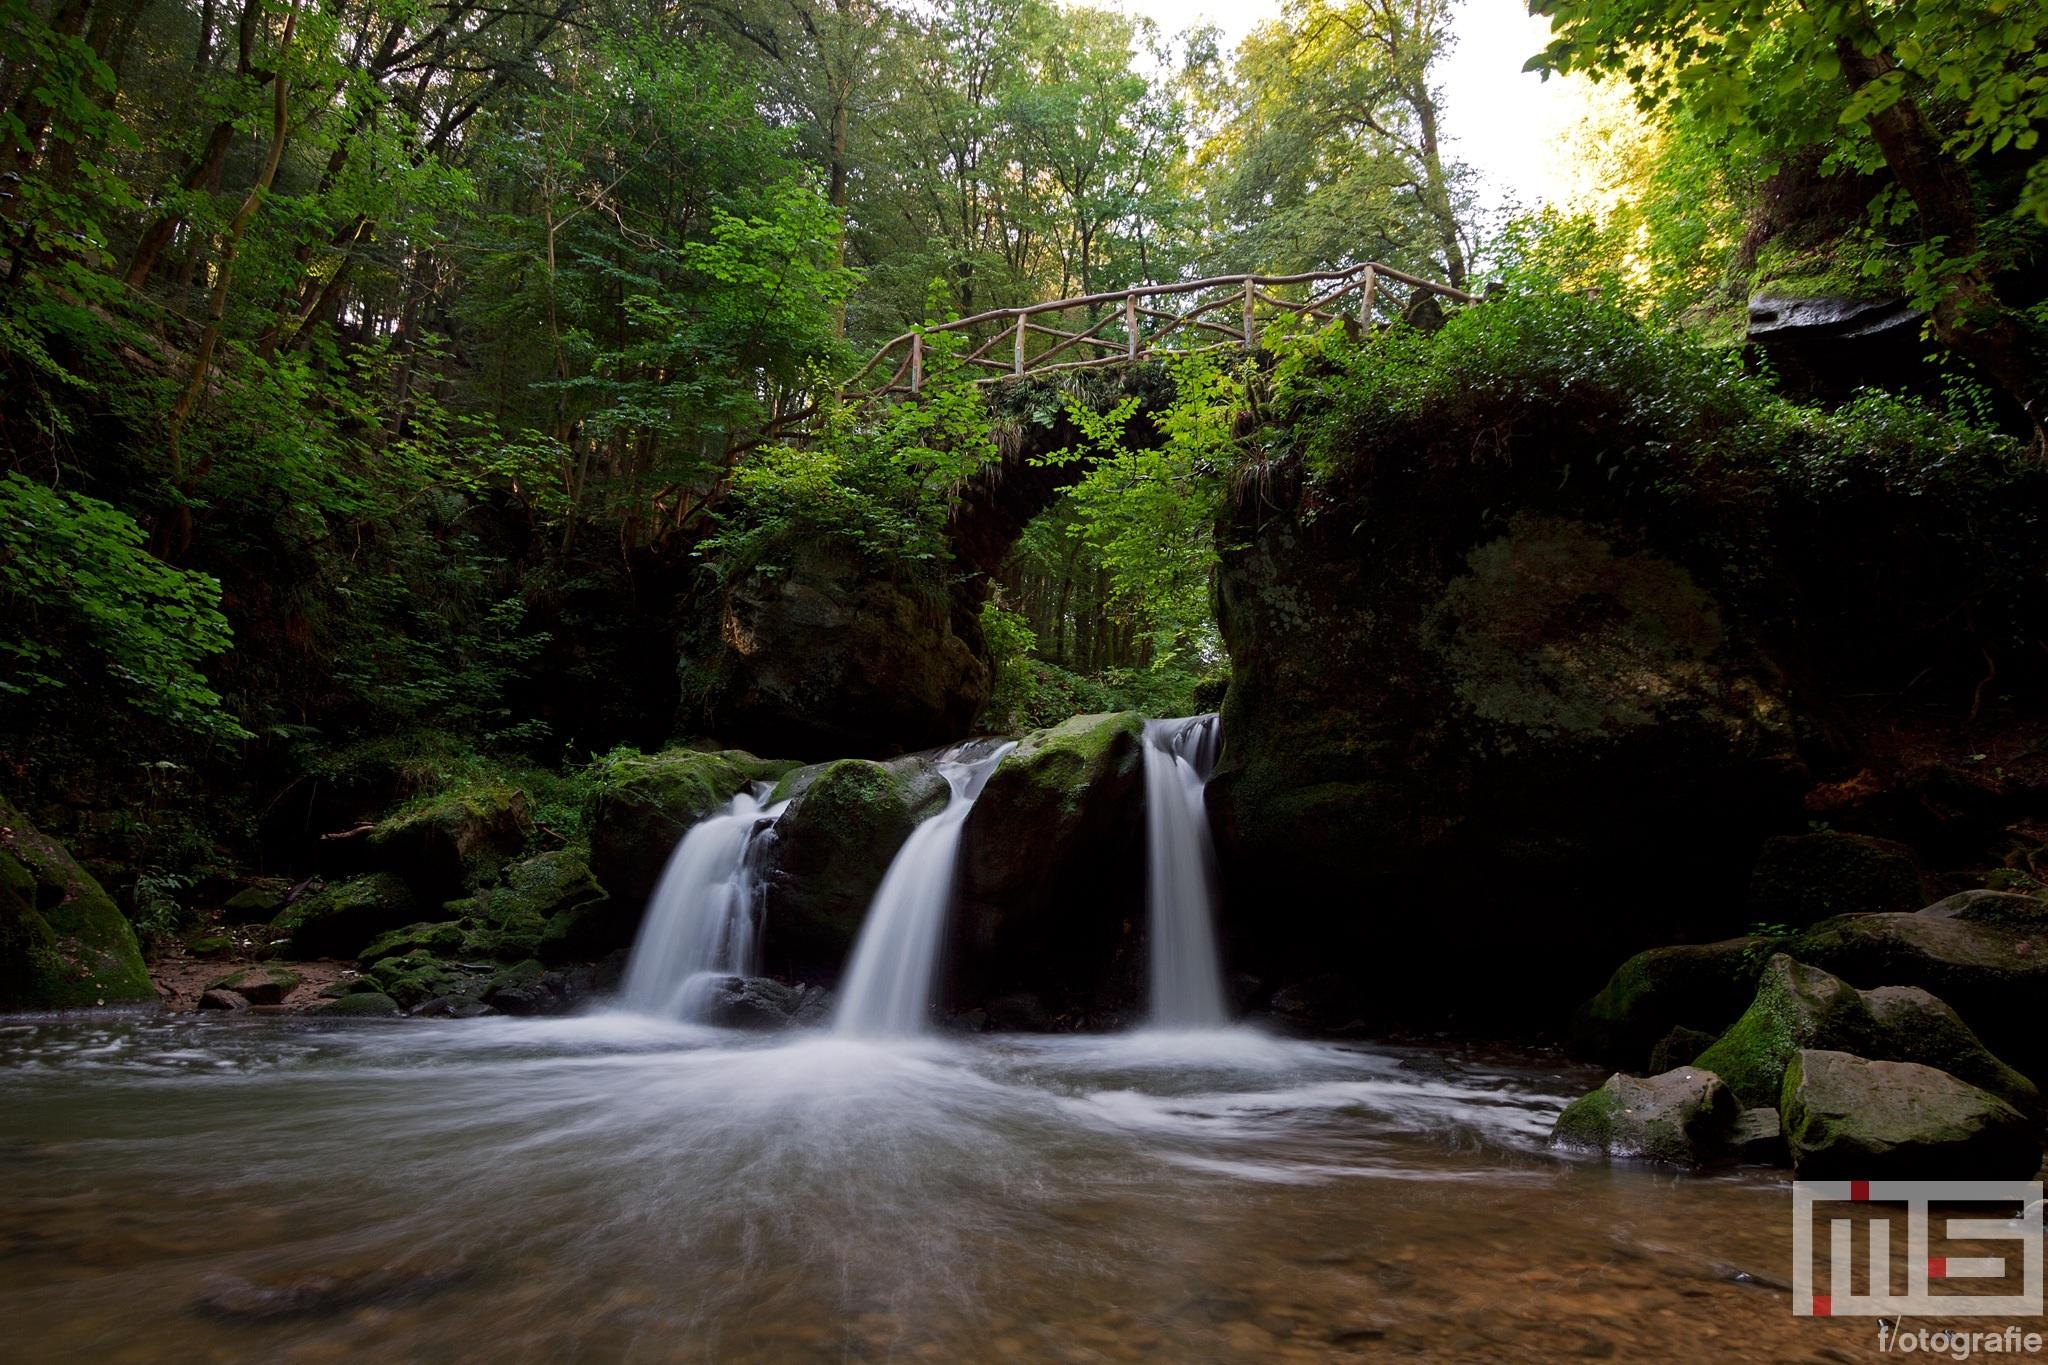 De waterval Schiessentumpel in Mullerthal Luxemburg